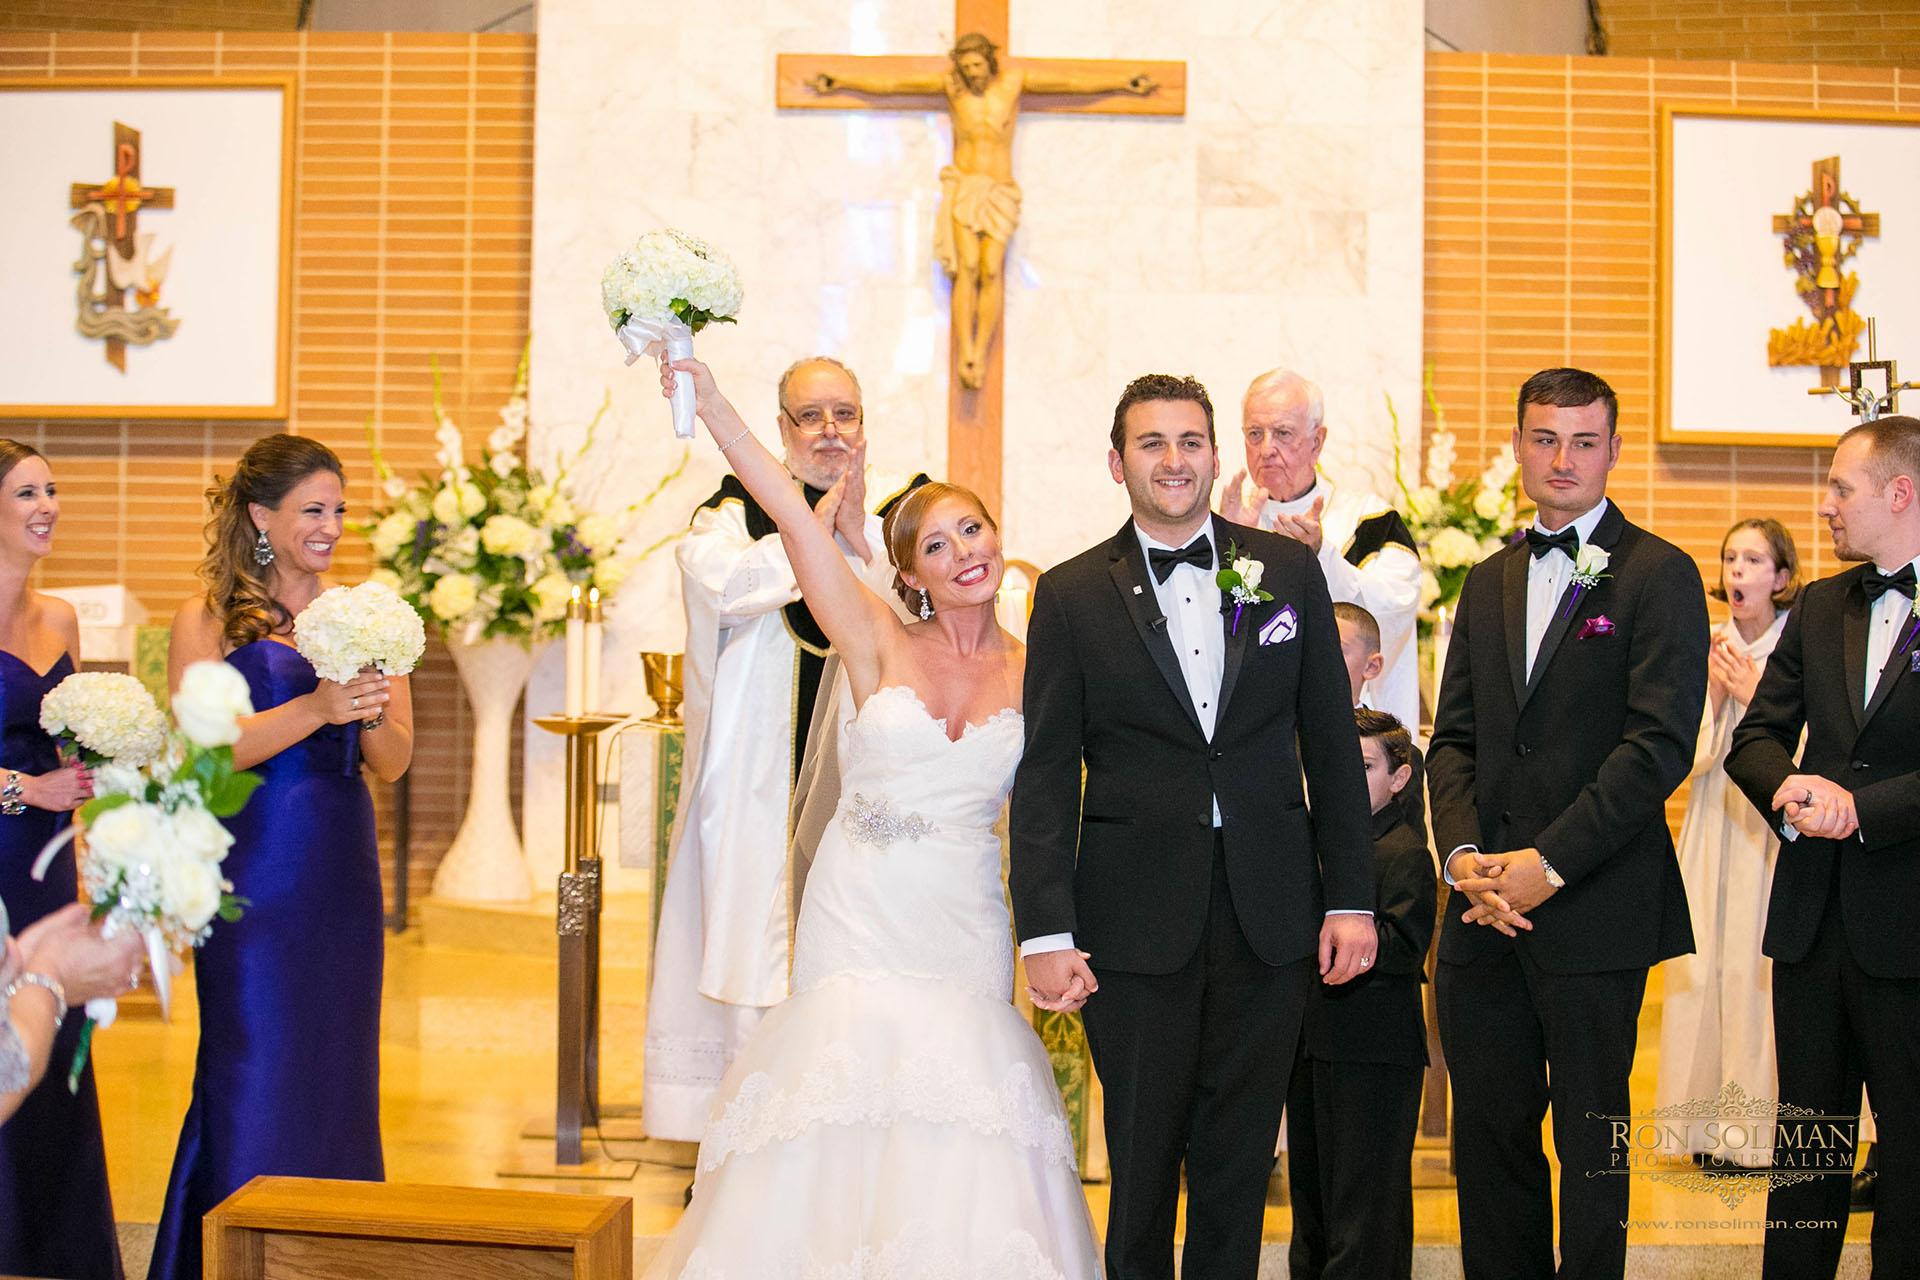 THE VIE WEDDING PHOTOS 40